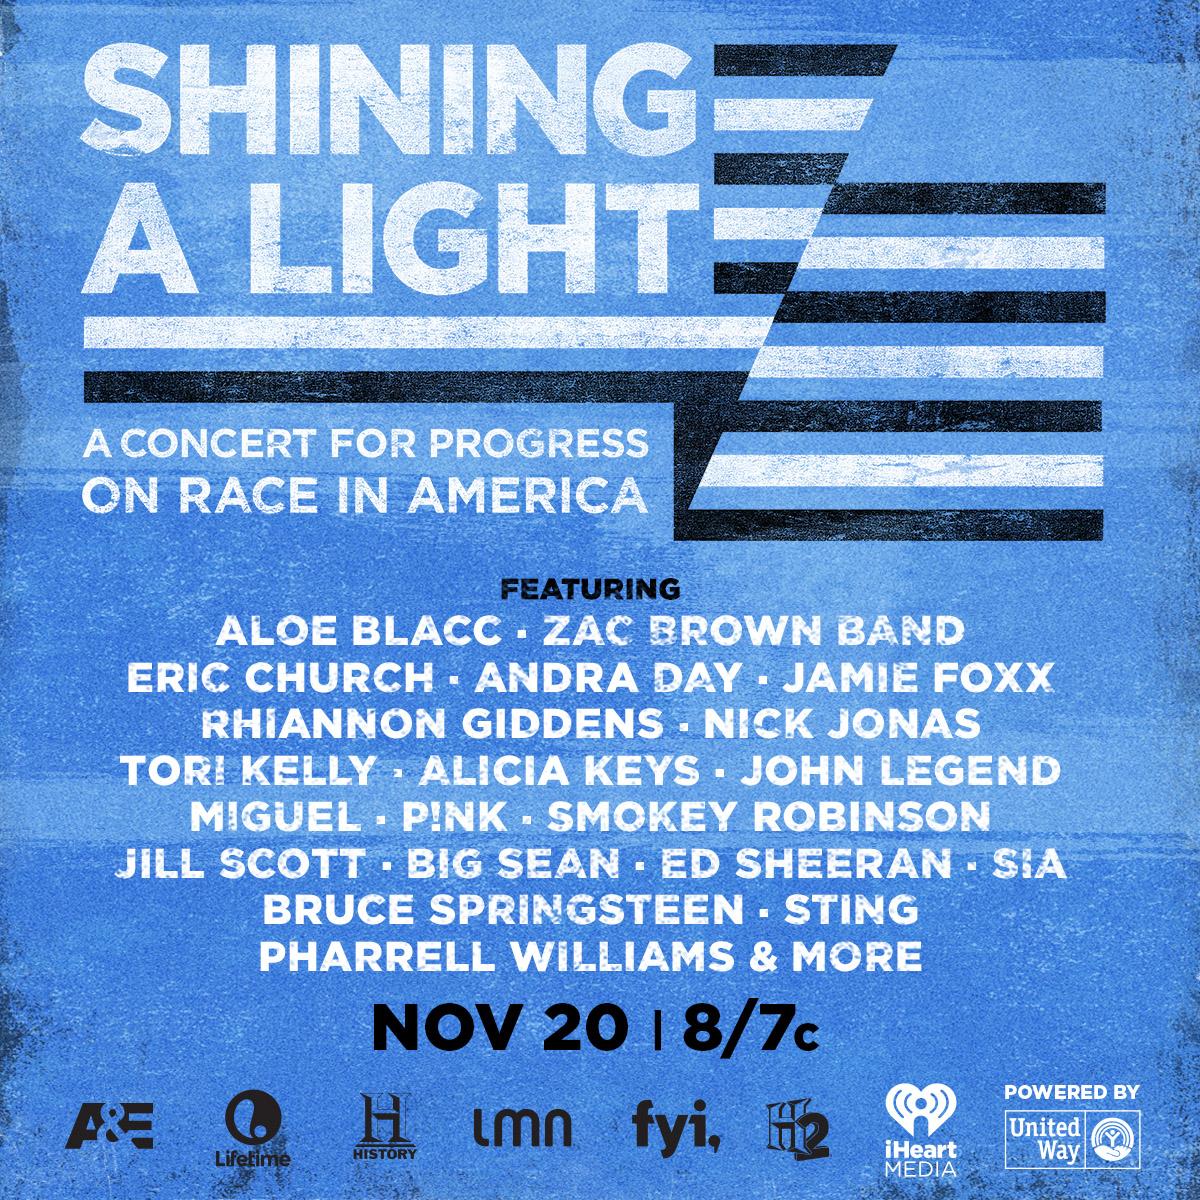 15-1198_Shining_a_Light_Concert_FB_1200x1200_blue_logostrip_FIN_rev_2